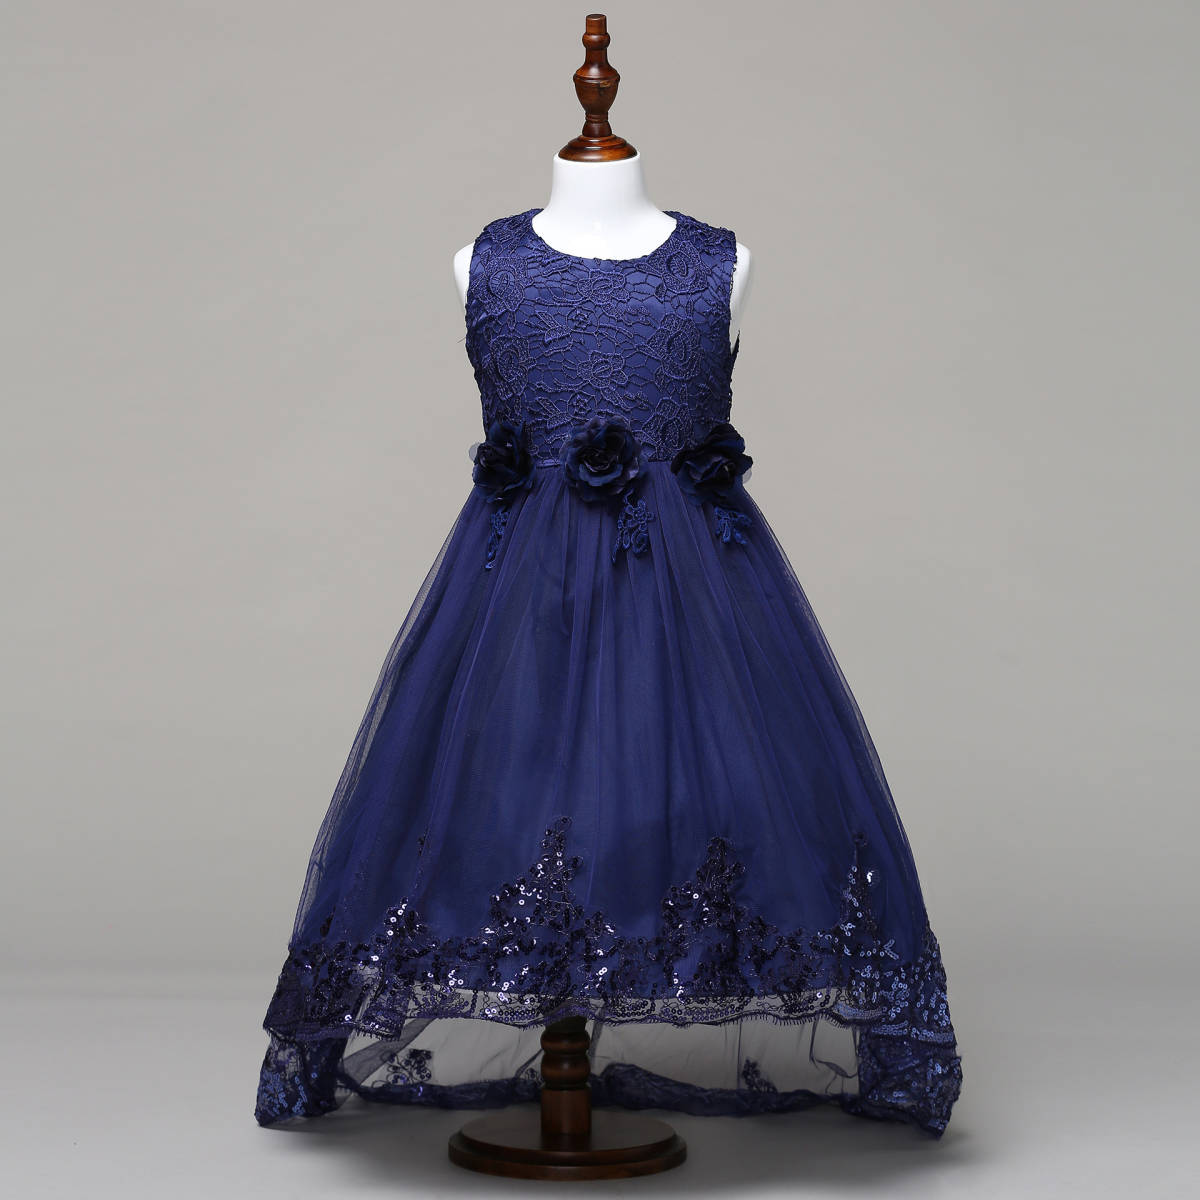 bb9115a762f46 子供ドレス ノースリーブロングドレス 花びらワンピース キッズ フォーマル 結婚式 発表会 女の子 レースの